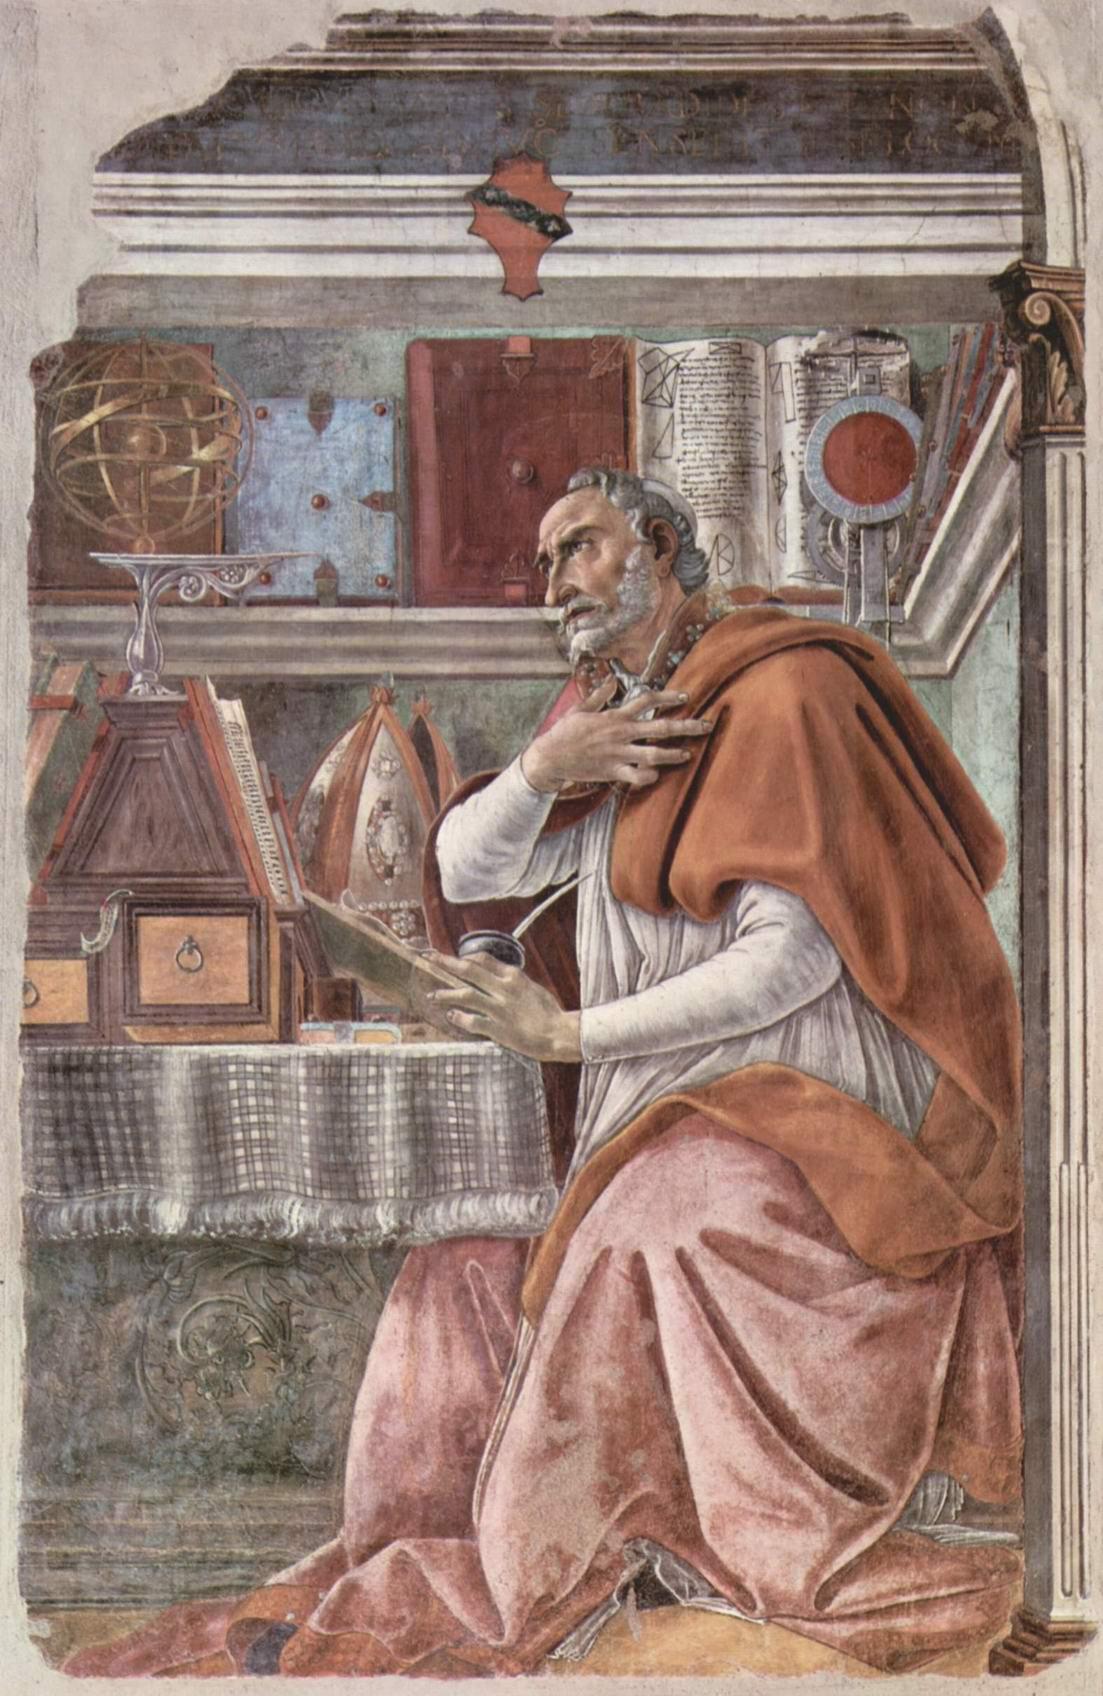 Св. Августин в молитвенном созерцании, Сандро Боттичелли